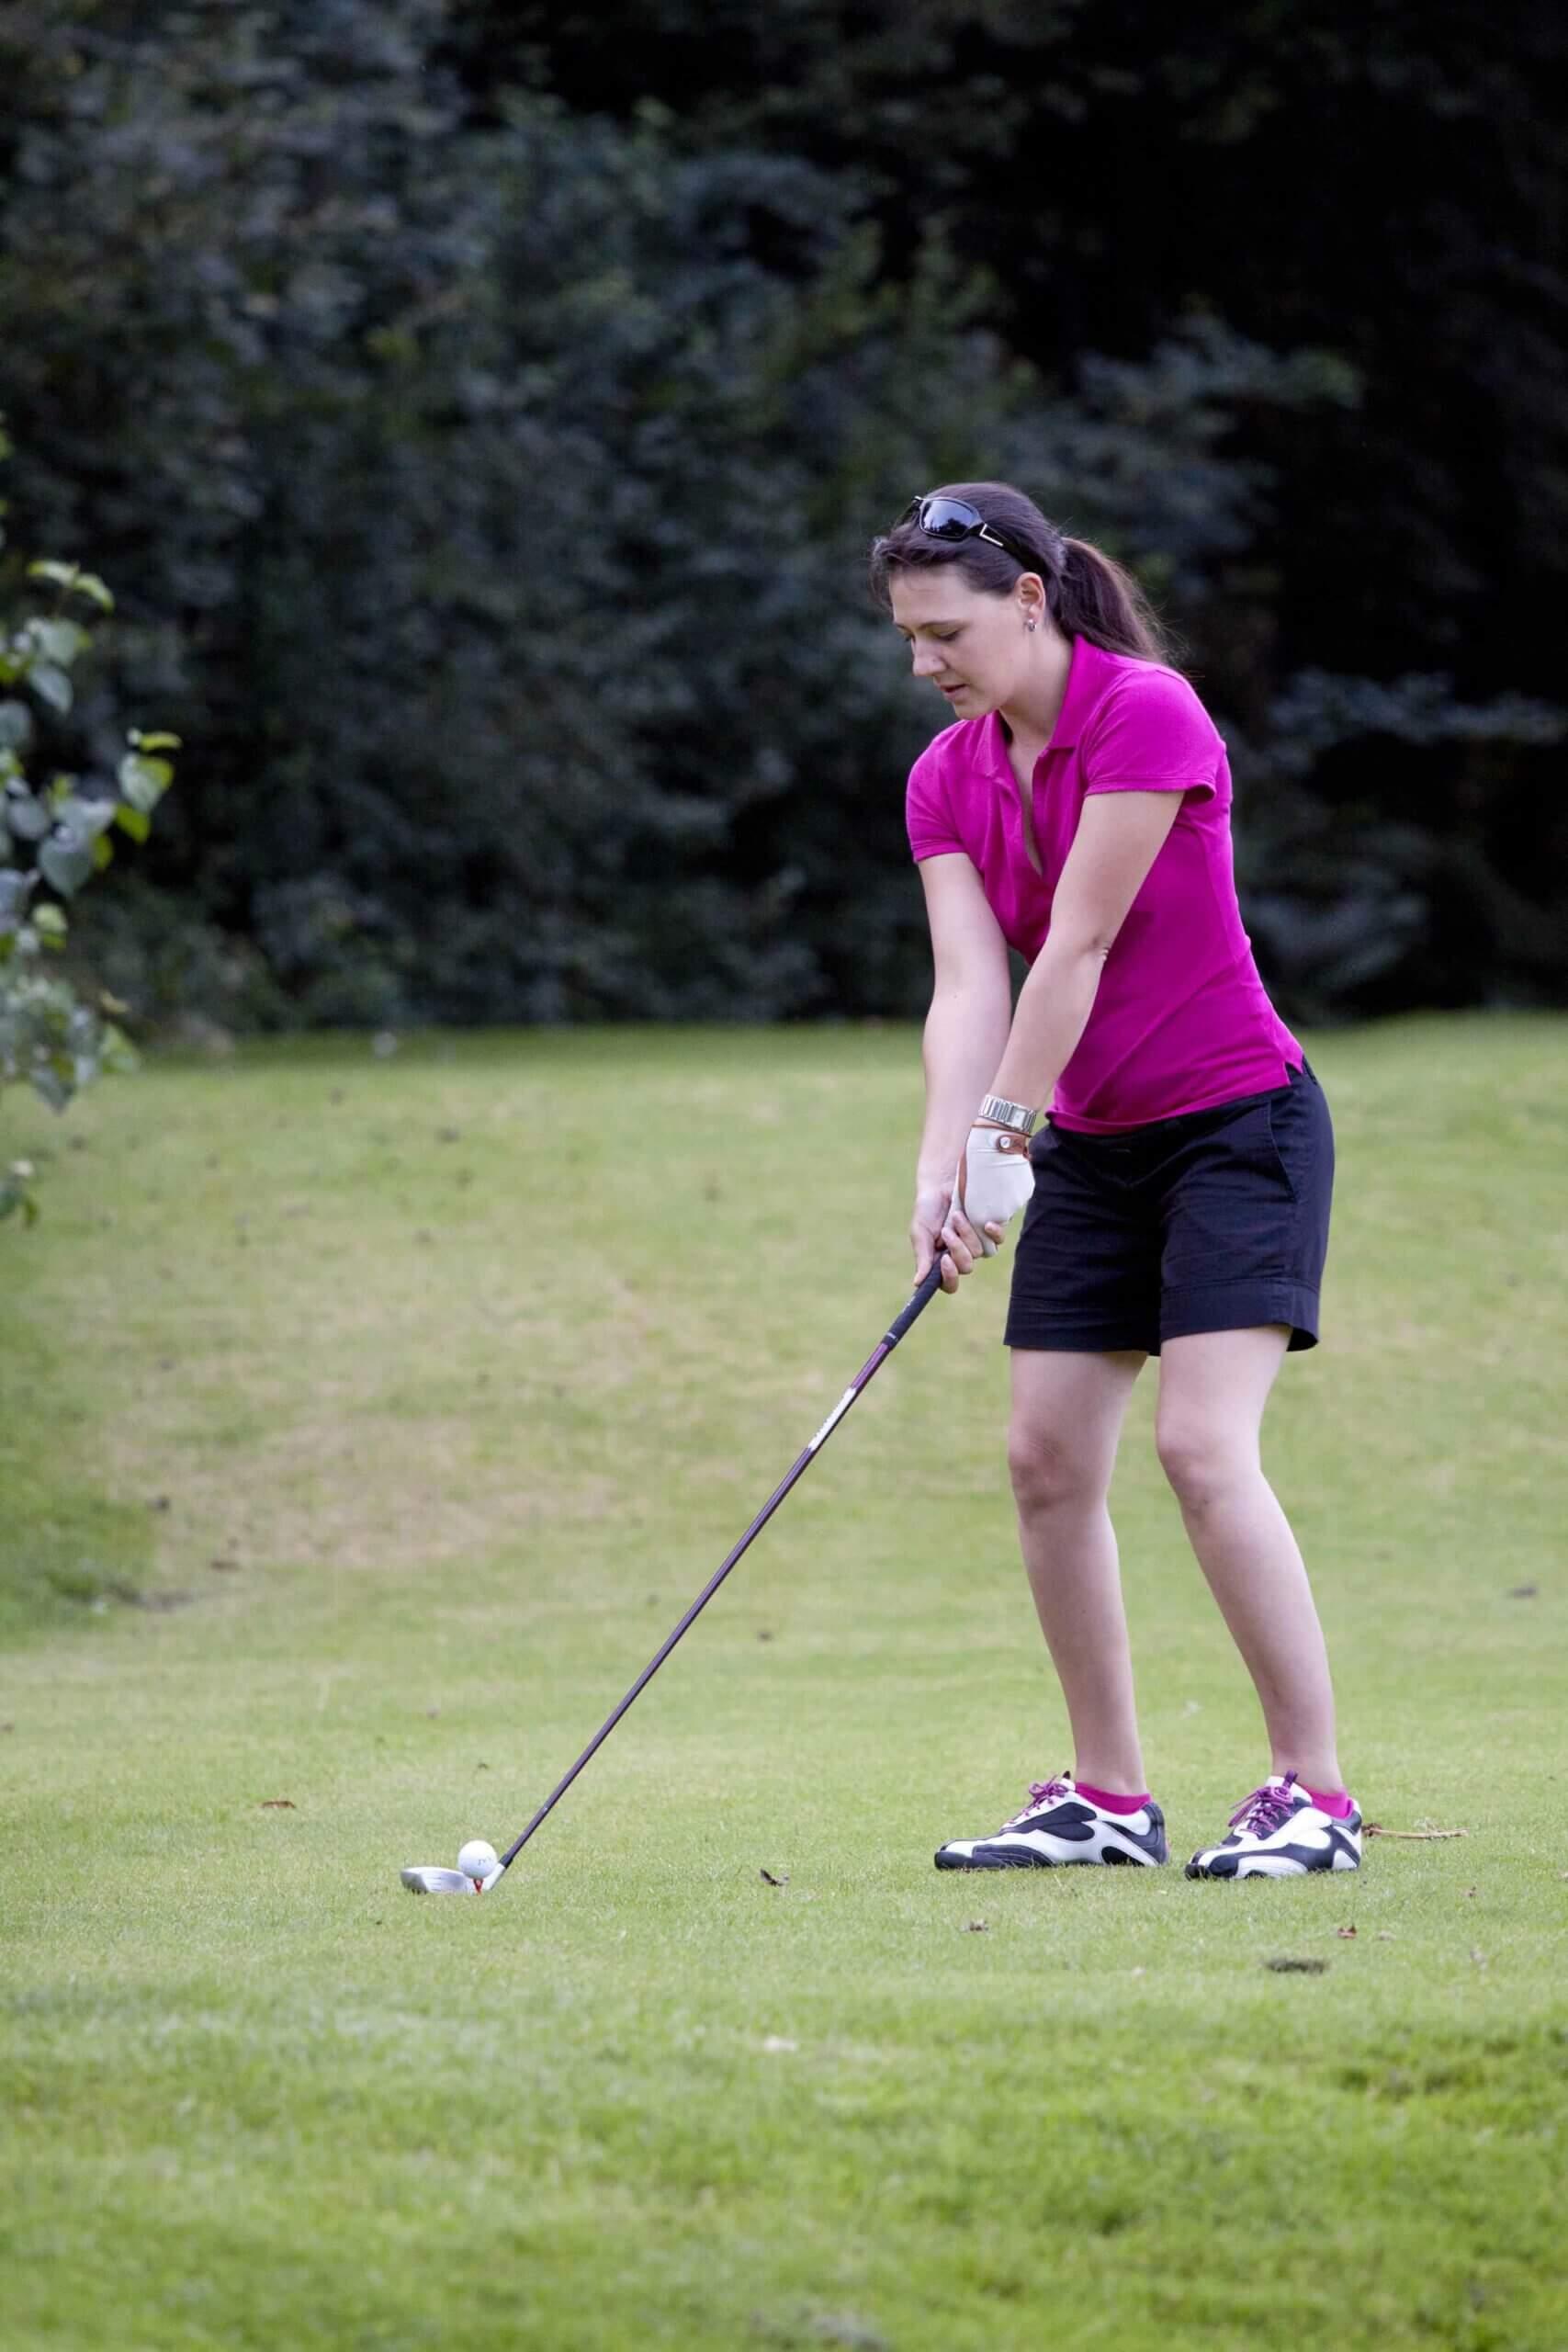 Das Golf Special zur offiziellen DGV Platzreife